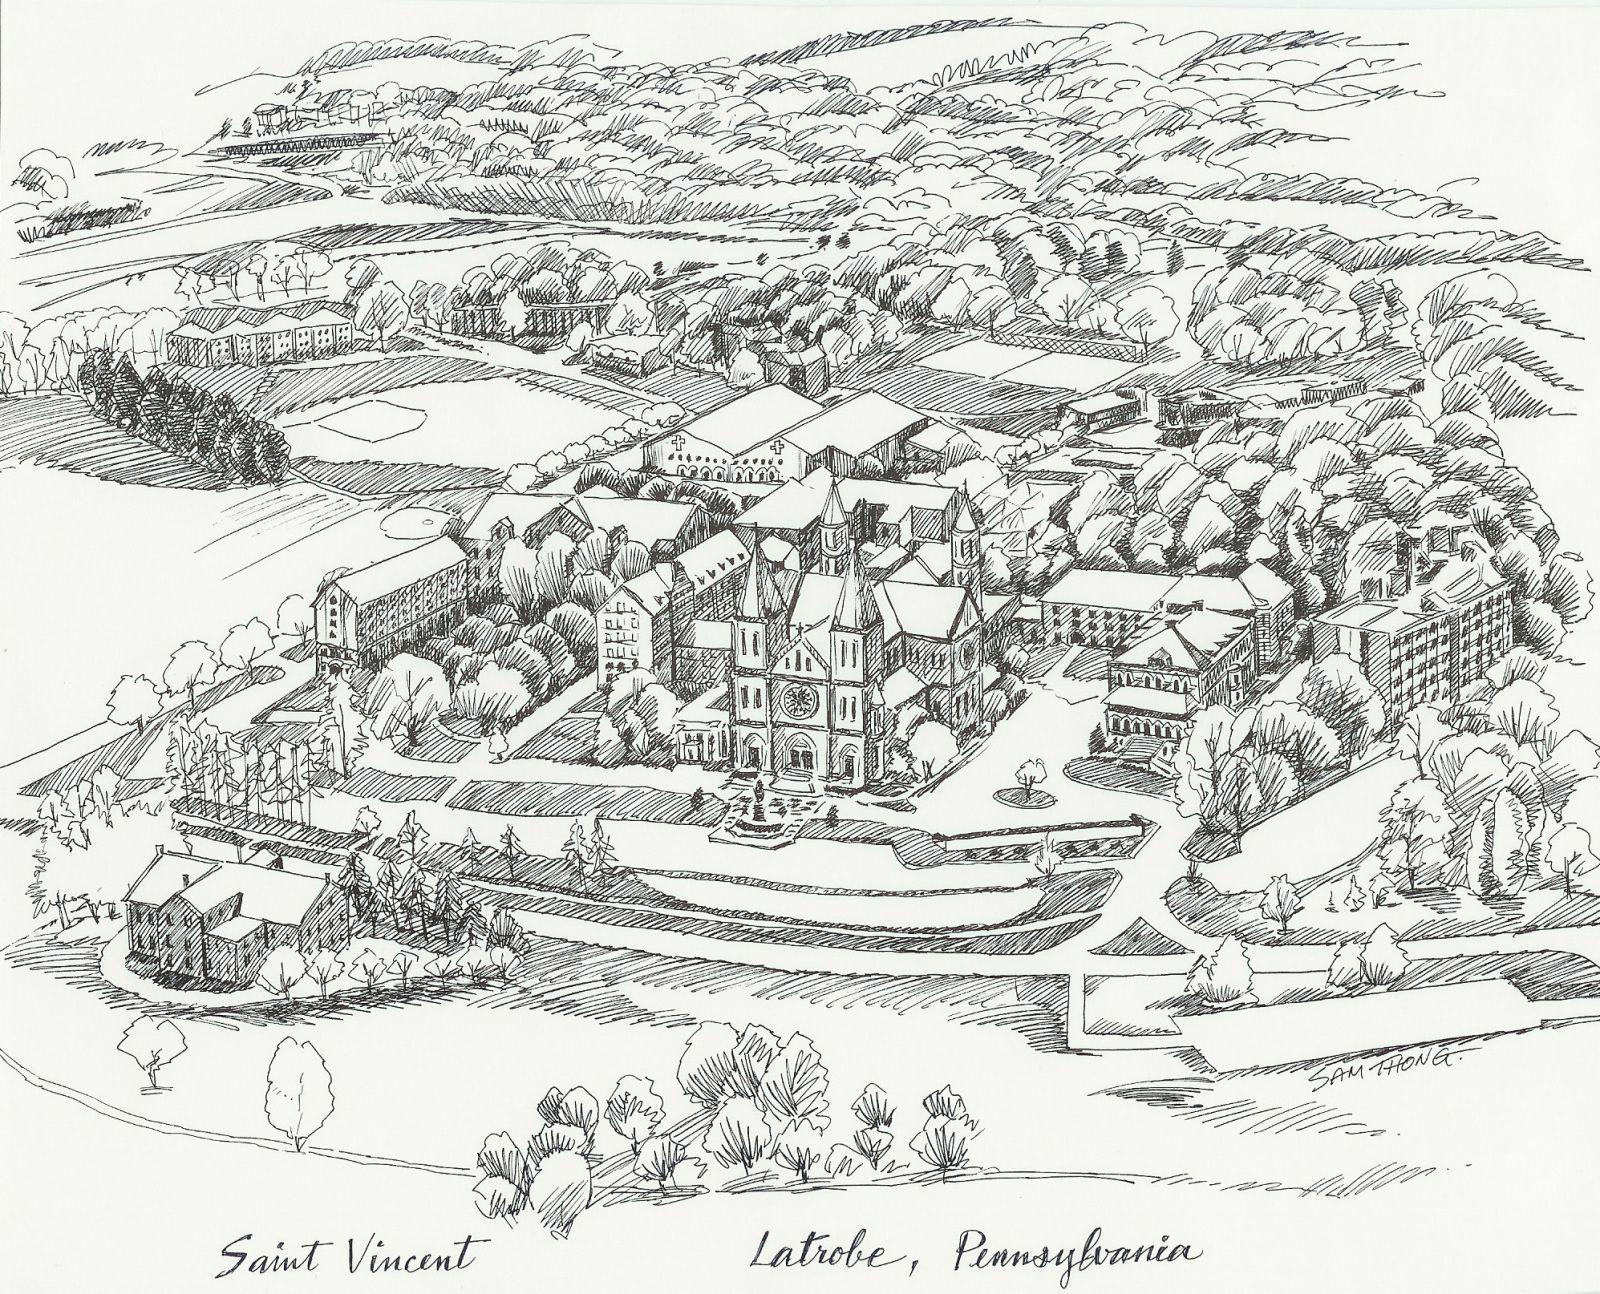 st vincent college campus map Campus Map Aerial View Line Drawing Saint Vincent College